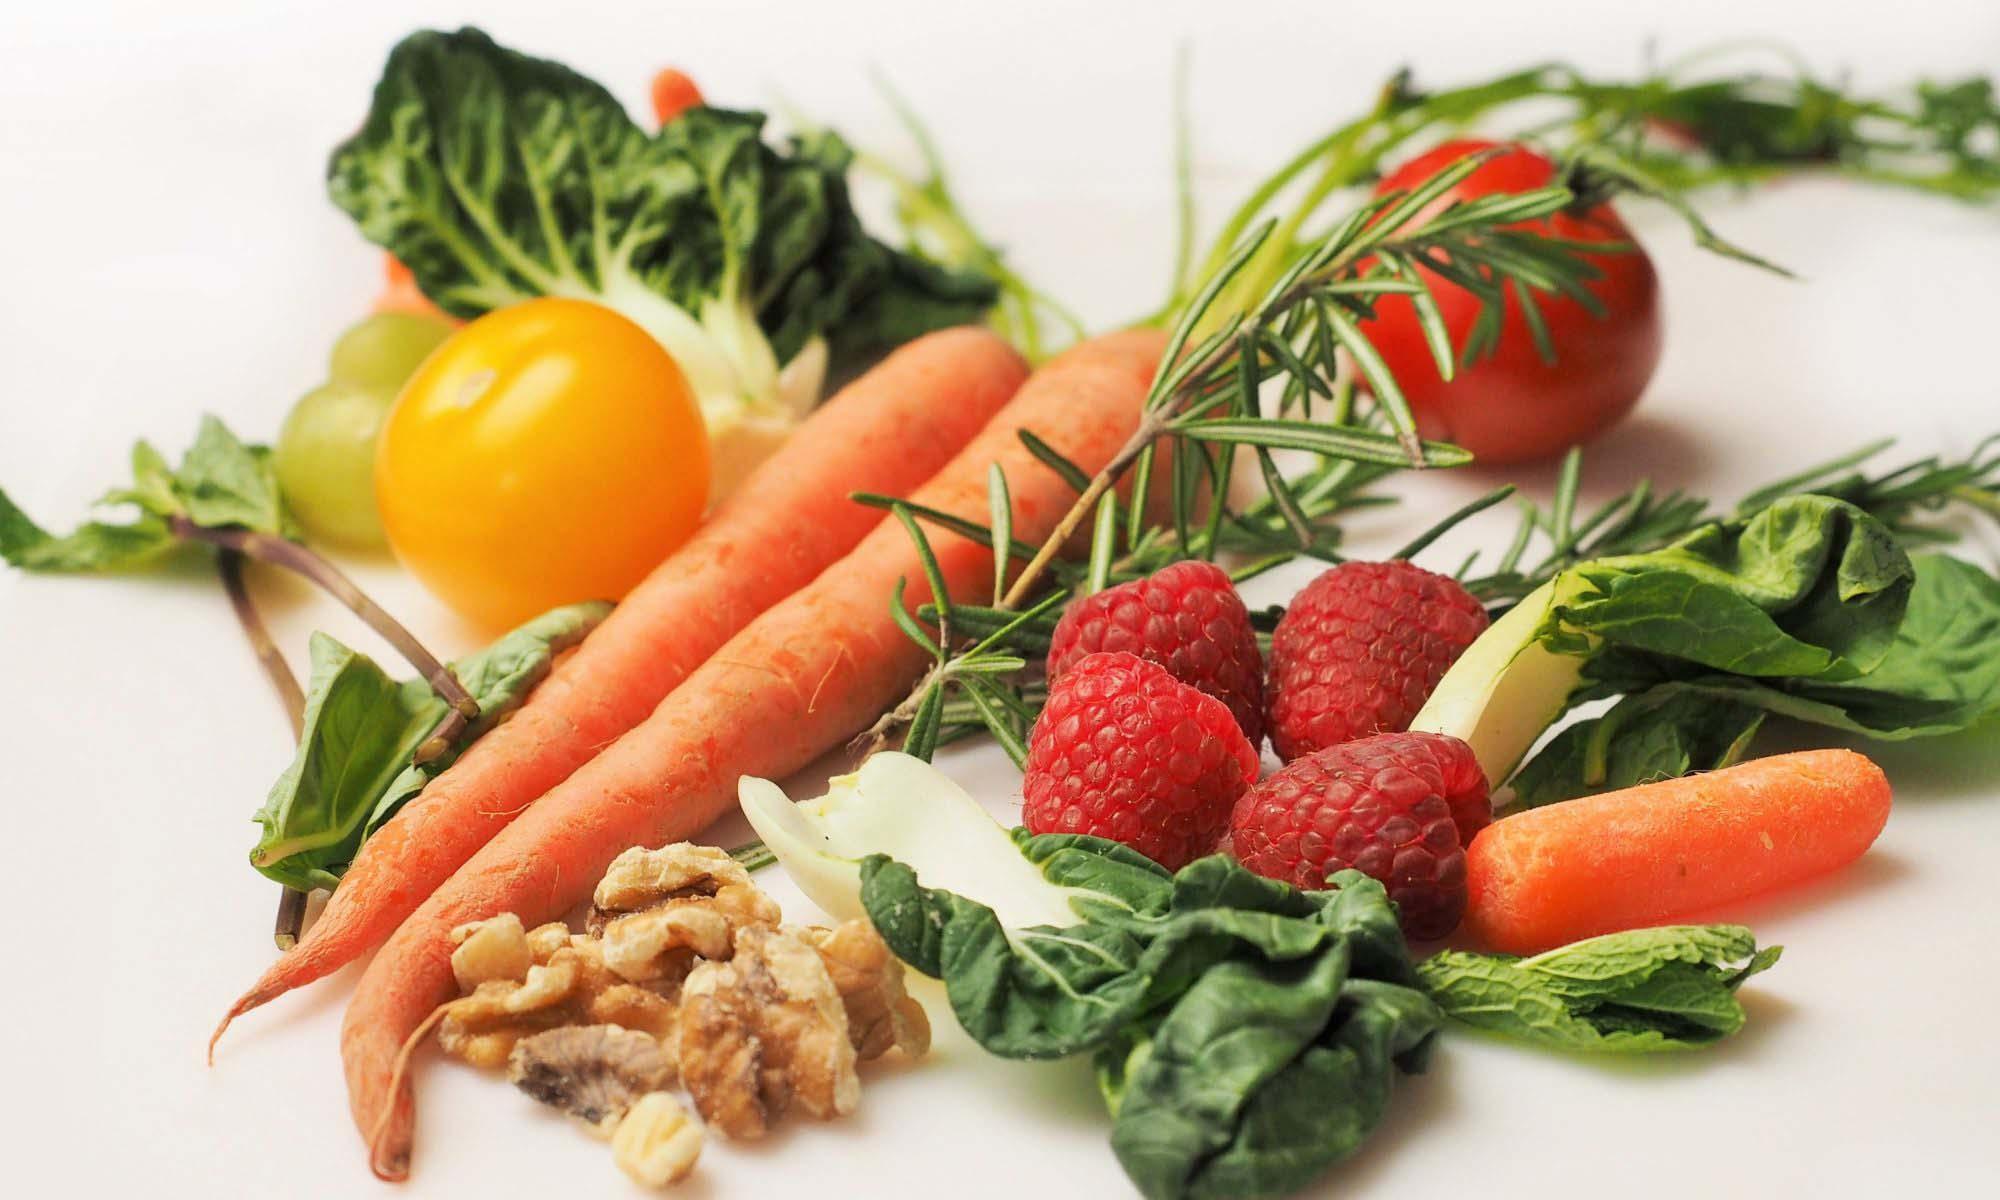 Should You Be Vegan?: HealthLabs.com Creates New Vegan Tests